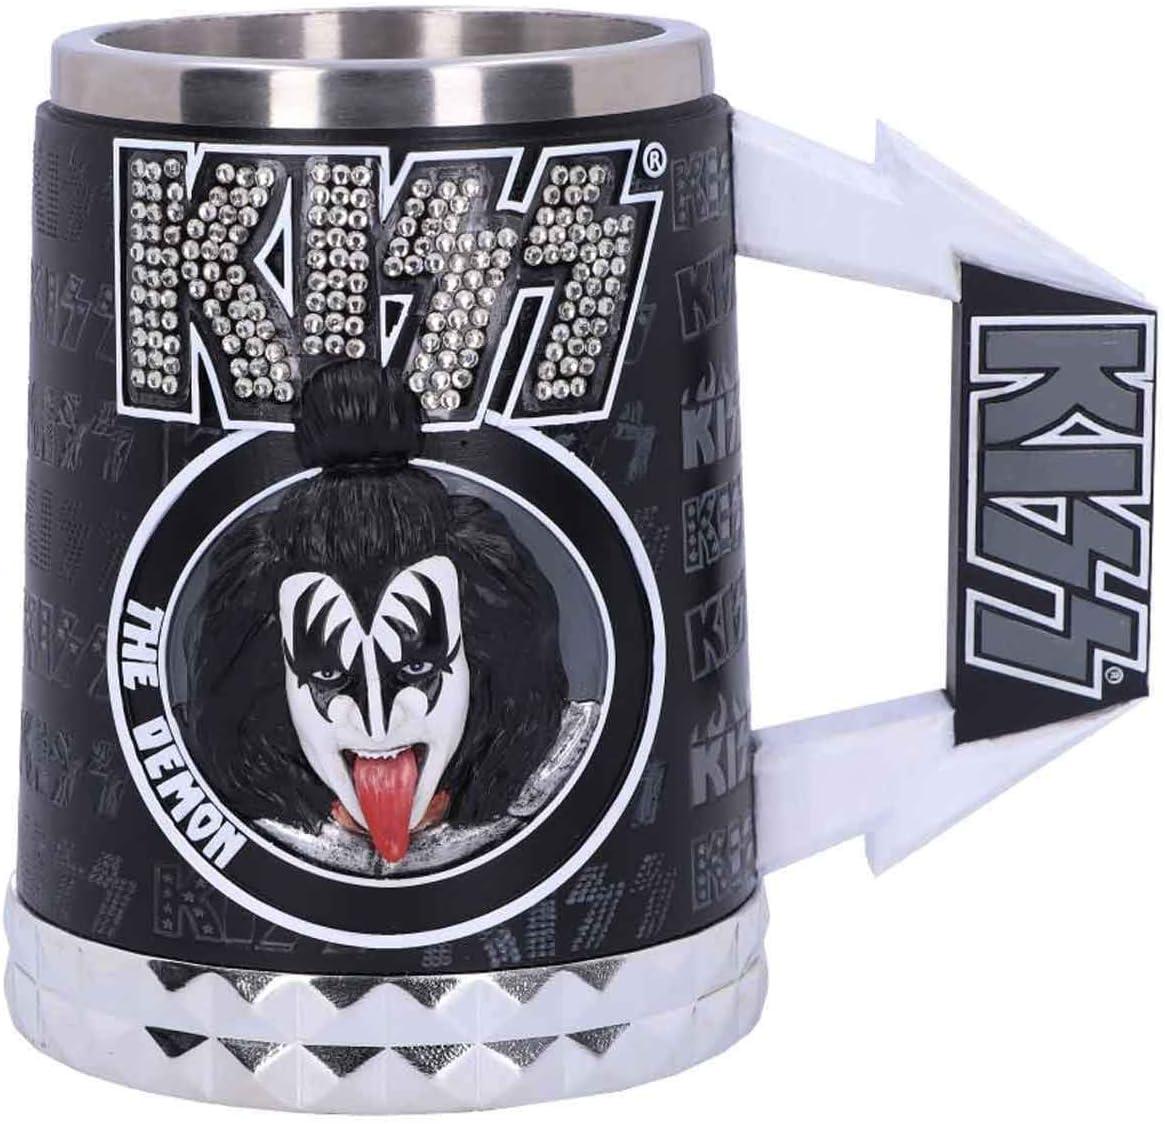 Kiss Tankard The Demon Gene Simmons Band Logo Nue offiziell Glam Range Boxed